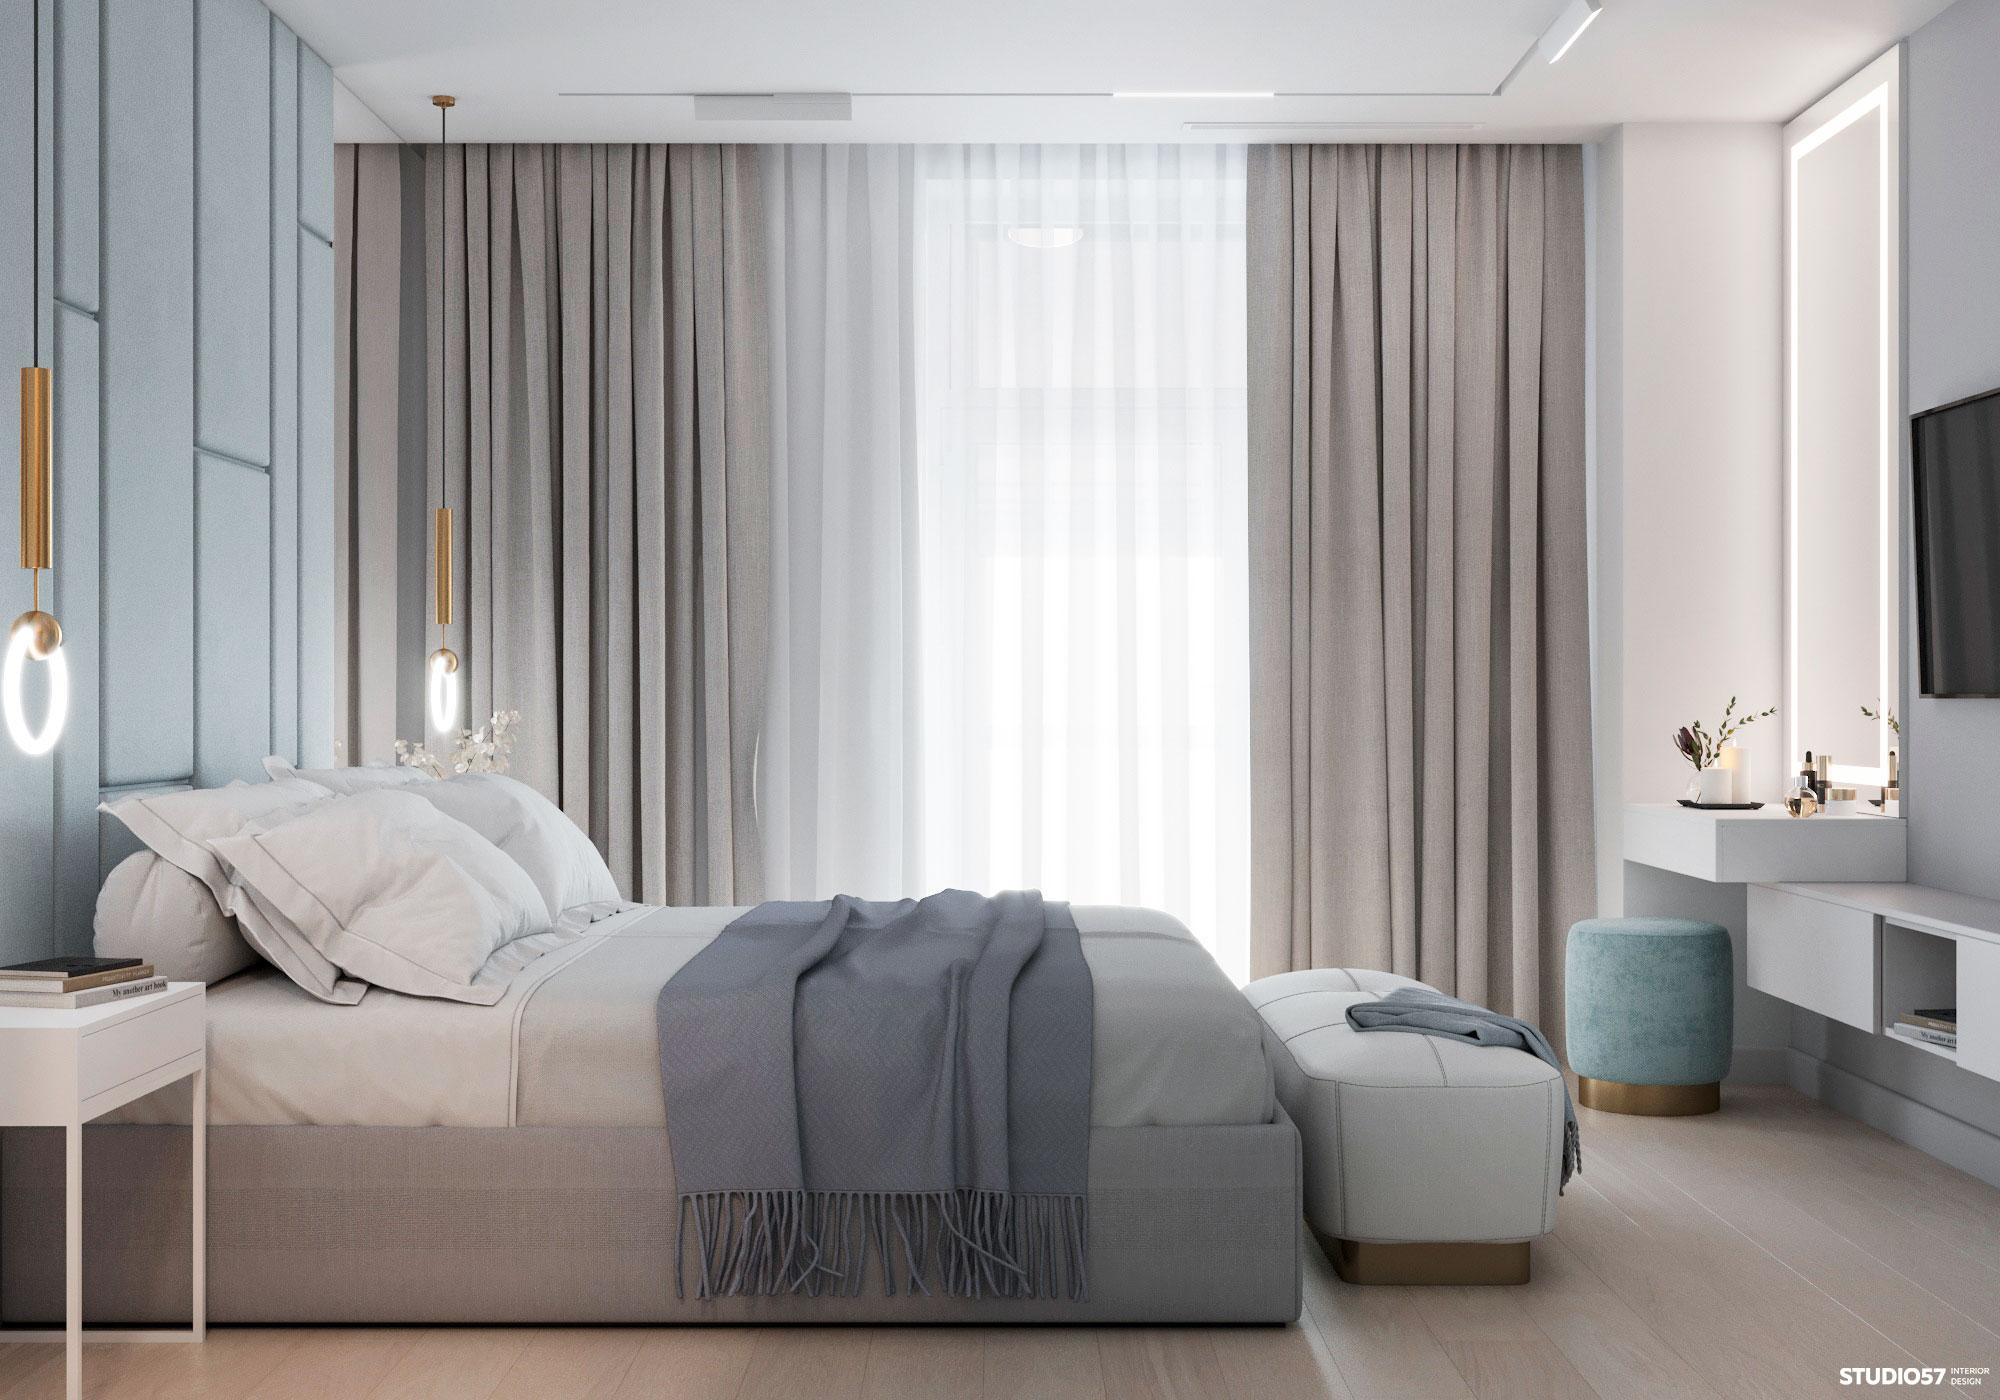 Интерьер спальни. Вид 2.